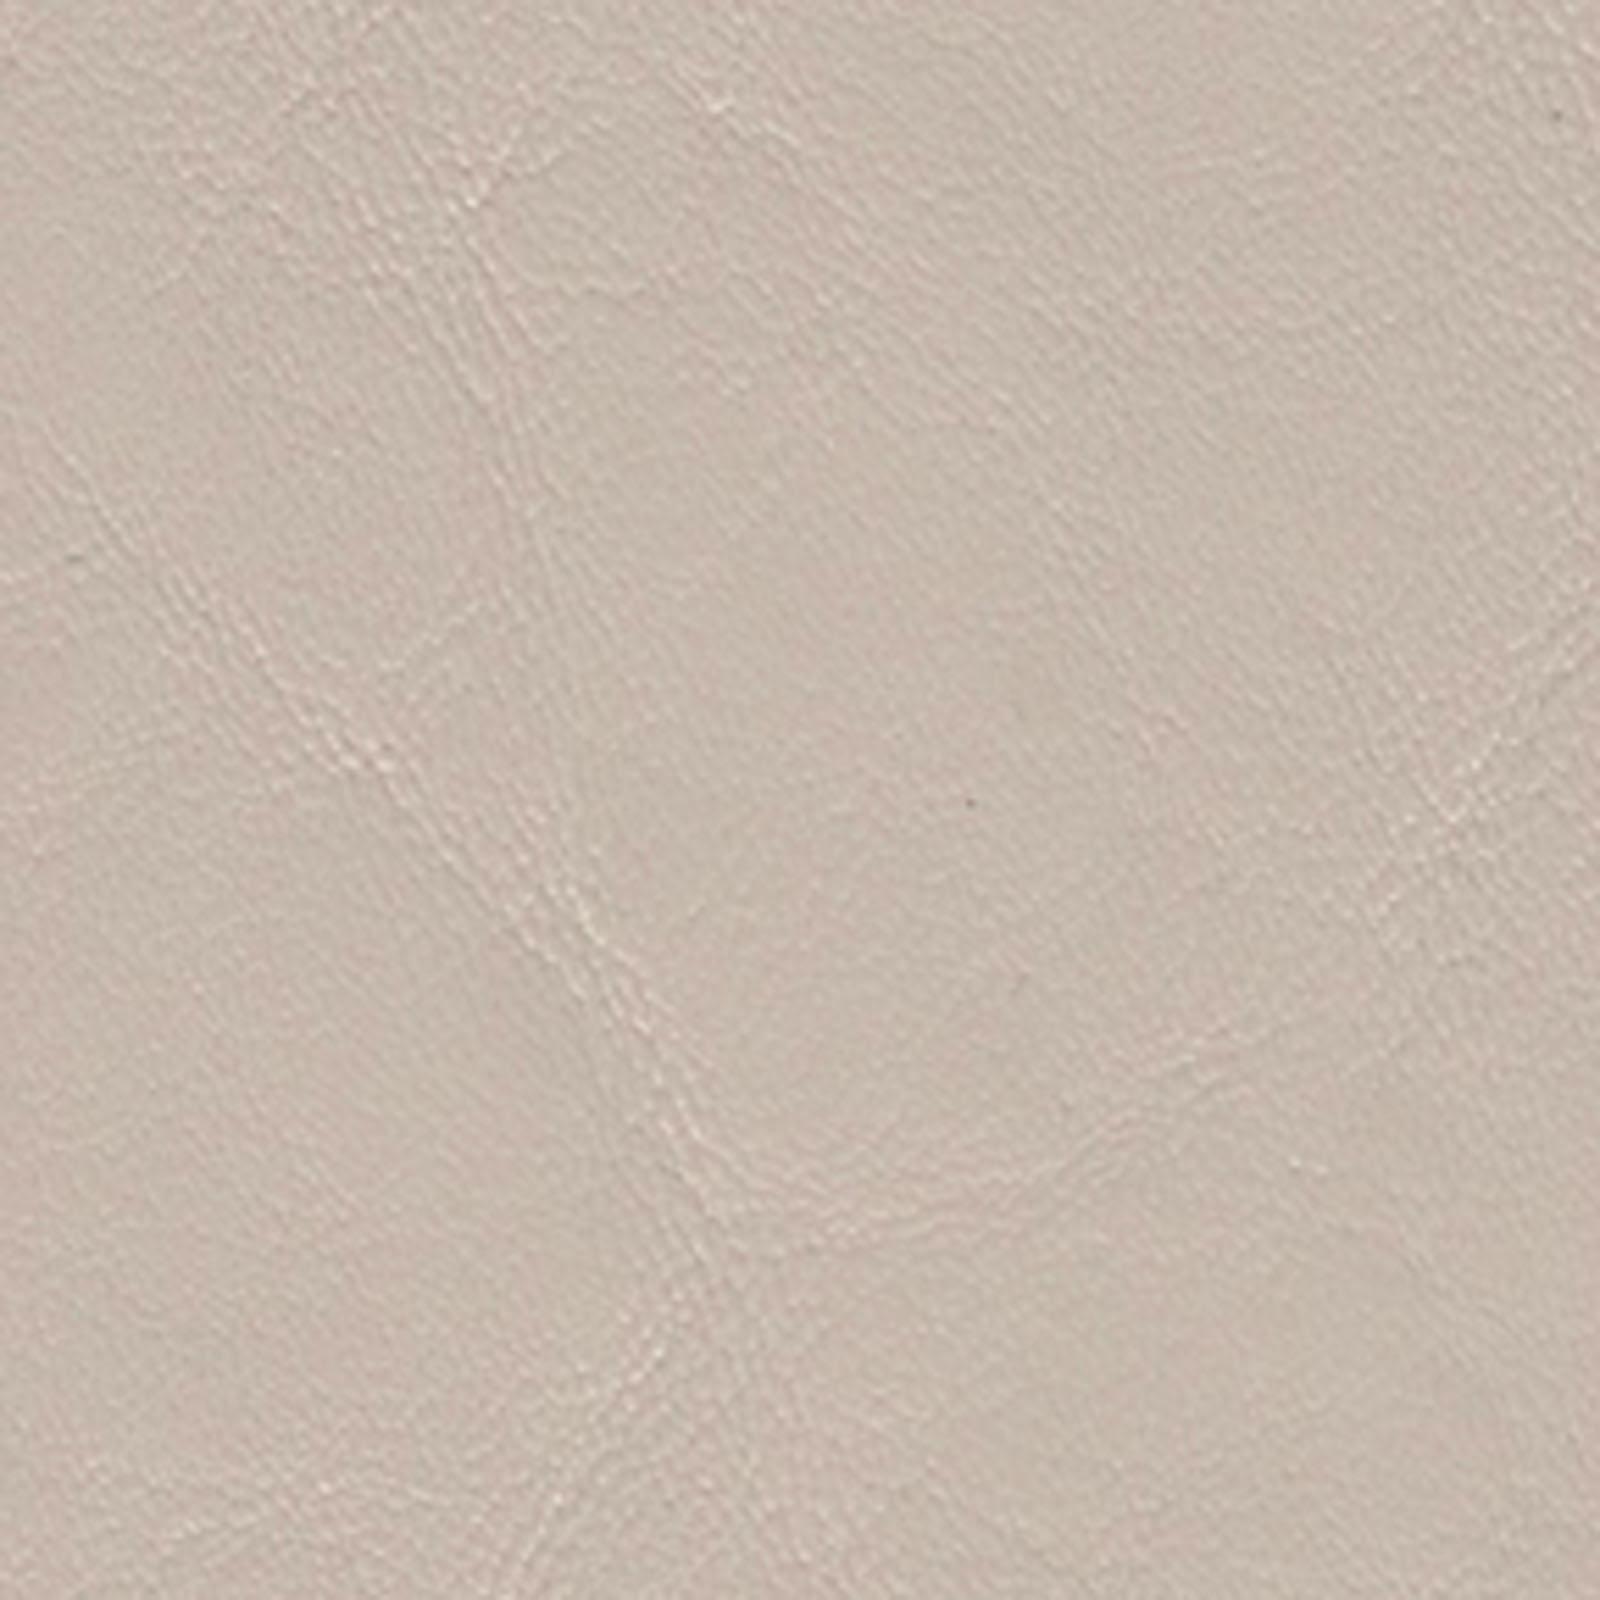 Islander - ISL-9151 - Oyster White